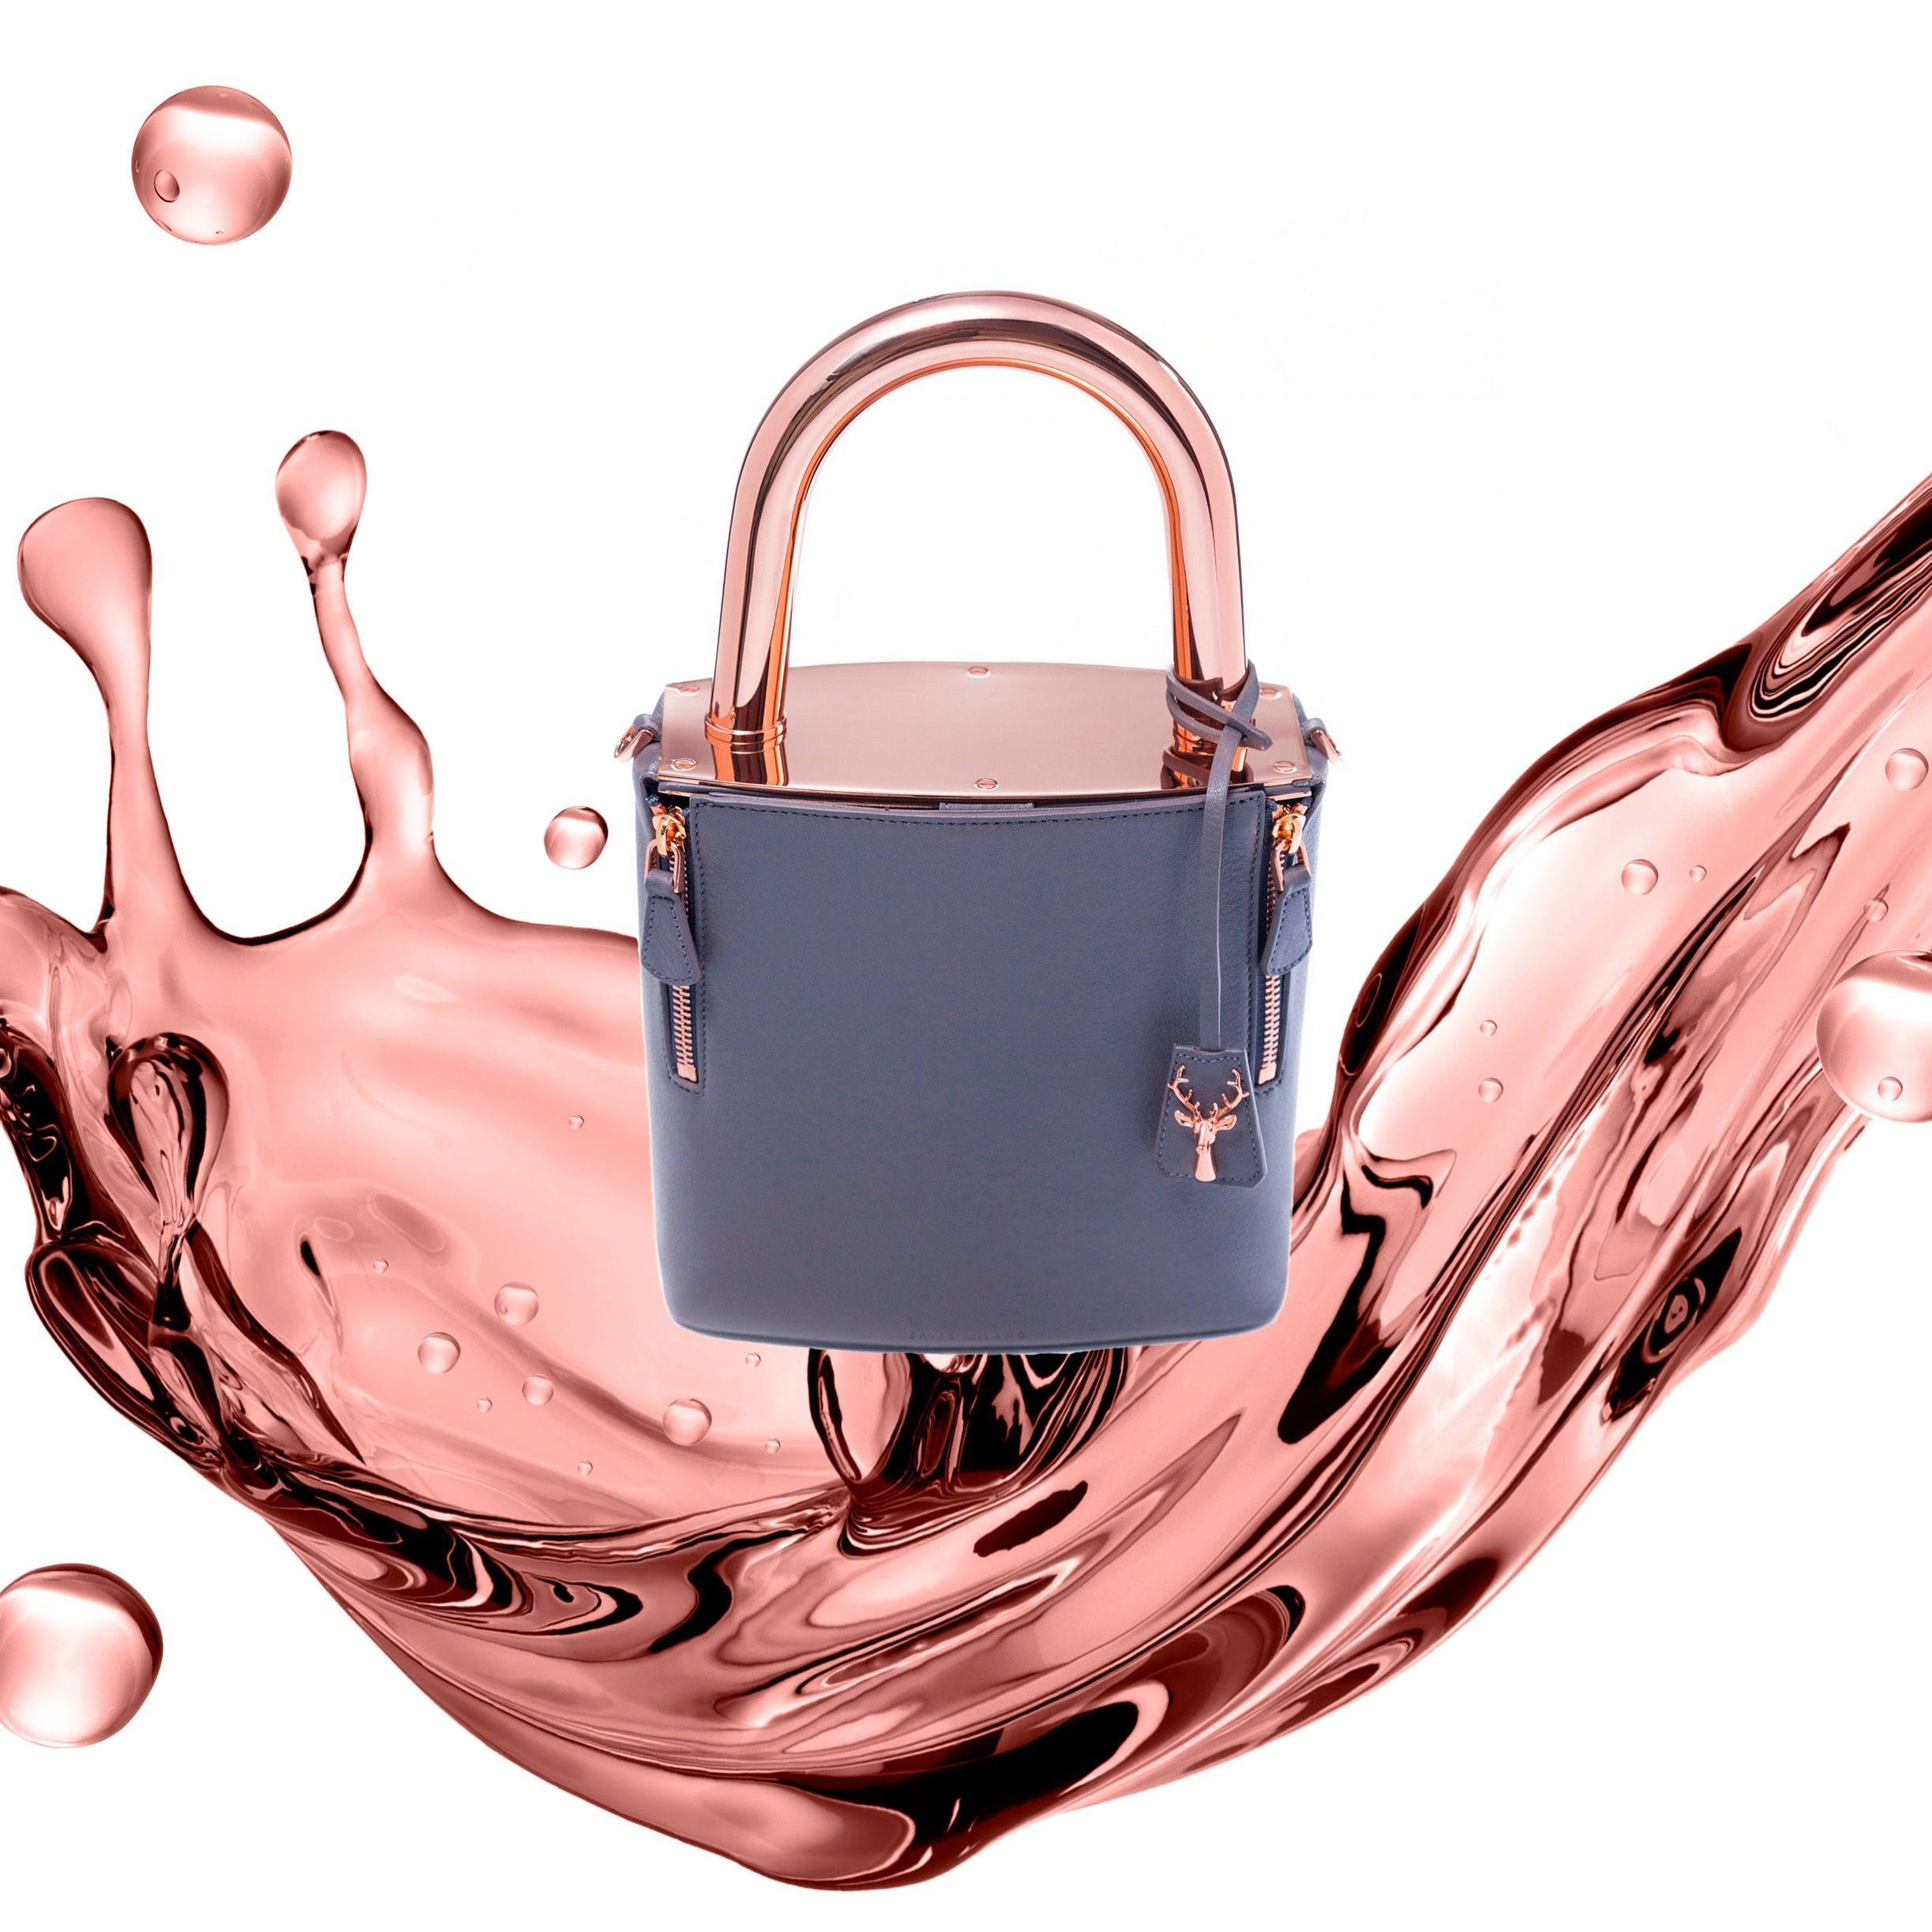 65d6a21685 Savas Milano Rose Gold Grey Leather lock it bag Padlock lucchetto lockit  handbag lady bag one of a kind bag